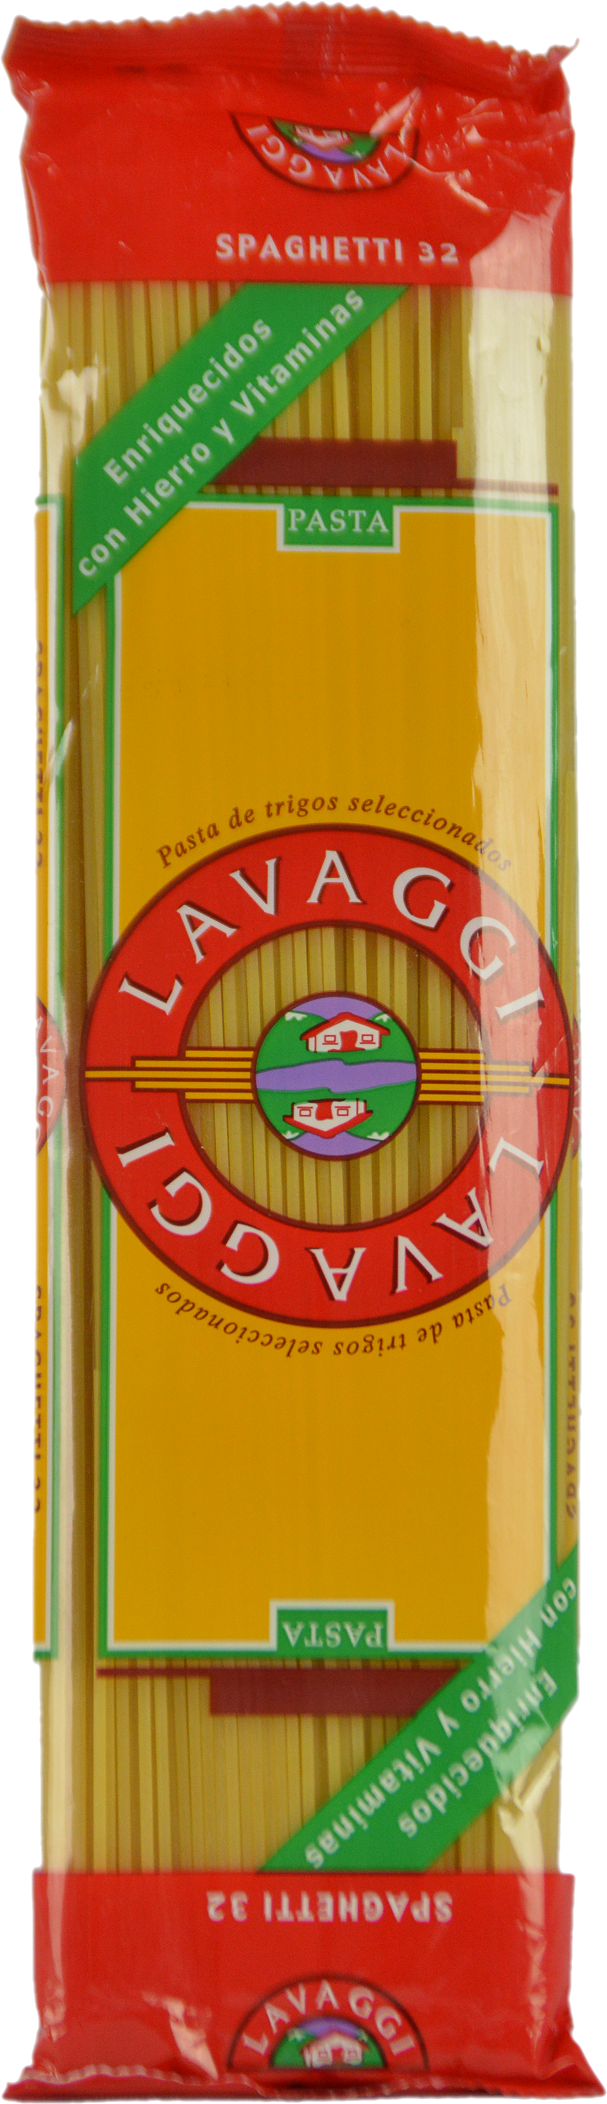 Spaguetti Lavagi / Case of 24 packs